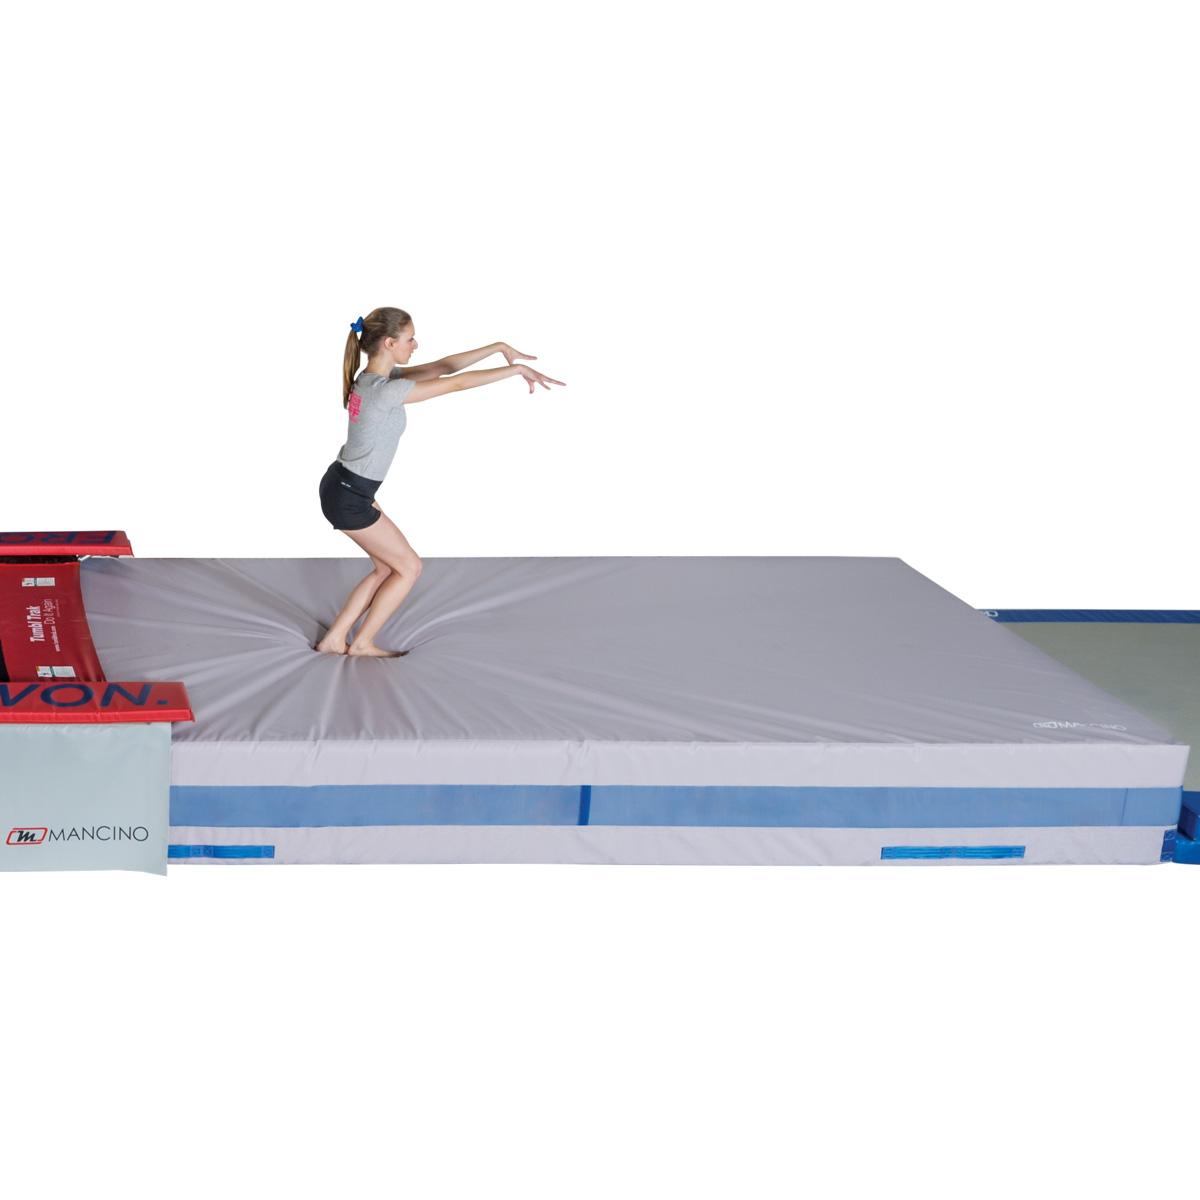 Tumbl Trak Landing Mat - soft landing mats - mancino mats